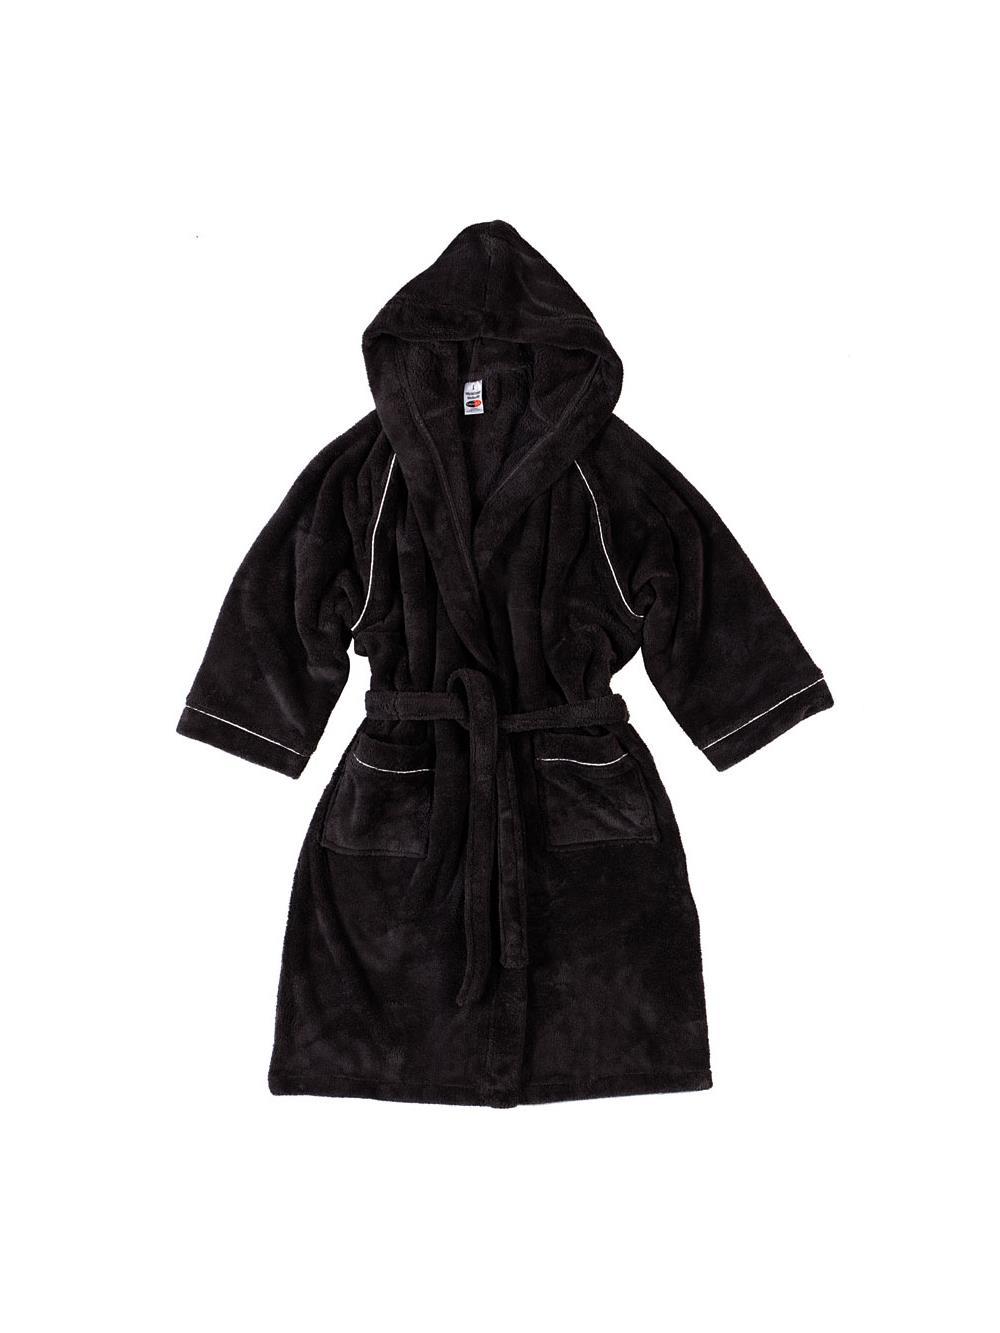 bademantel morgenmantel sauna microfaser kapuze kimono damen herren wellsoft ebay. Black Bedroom Furniture Sets. Home Design Ideas